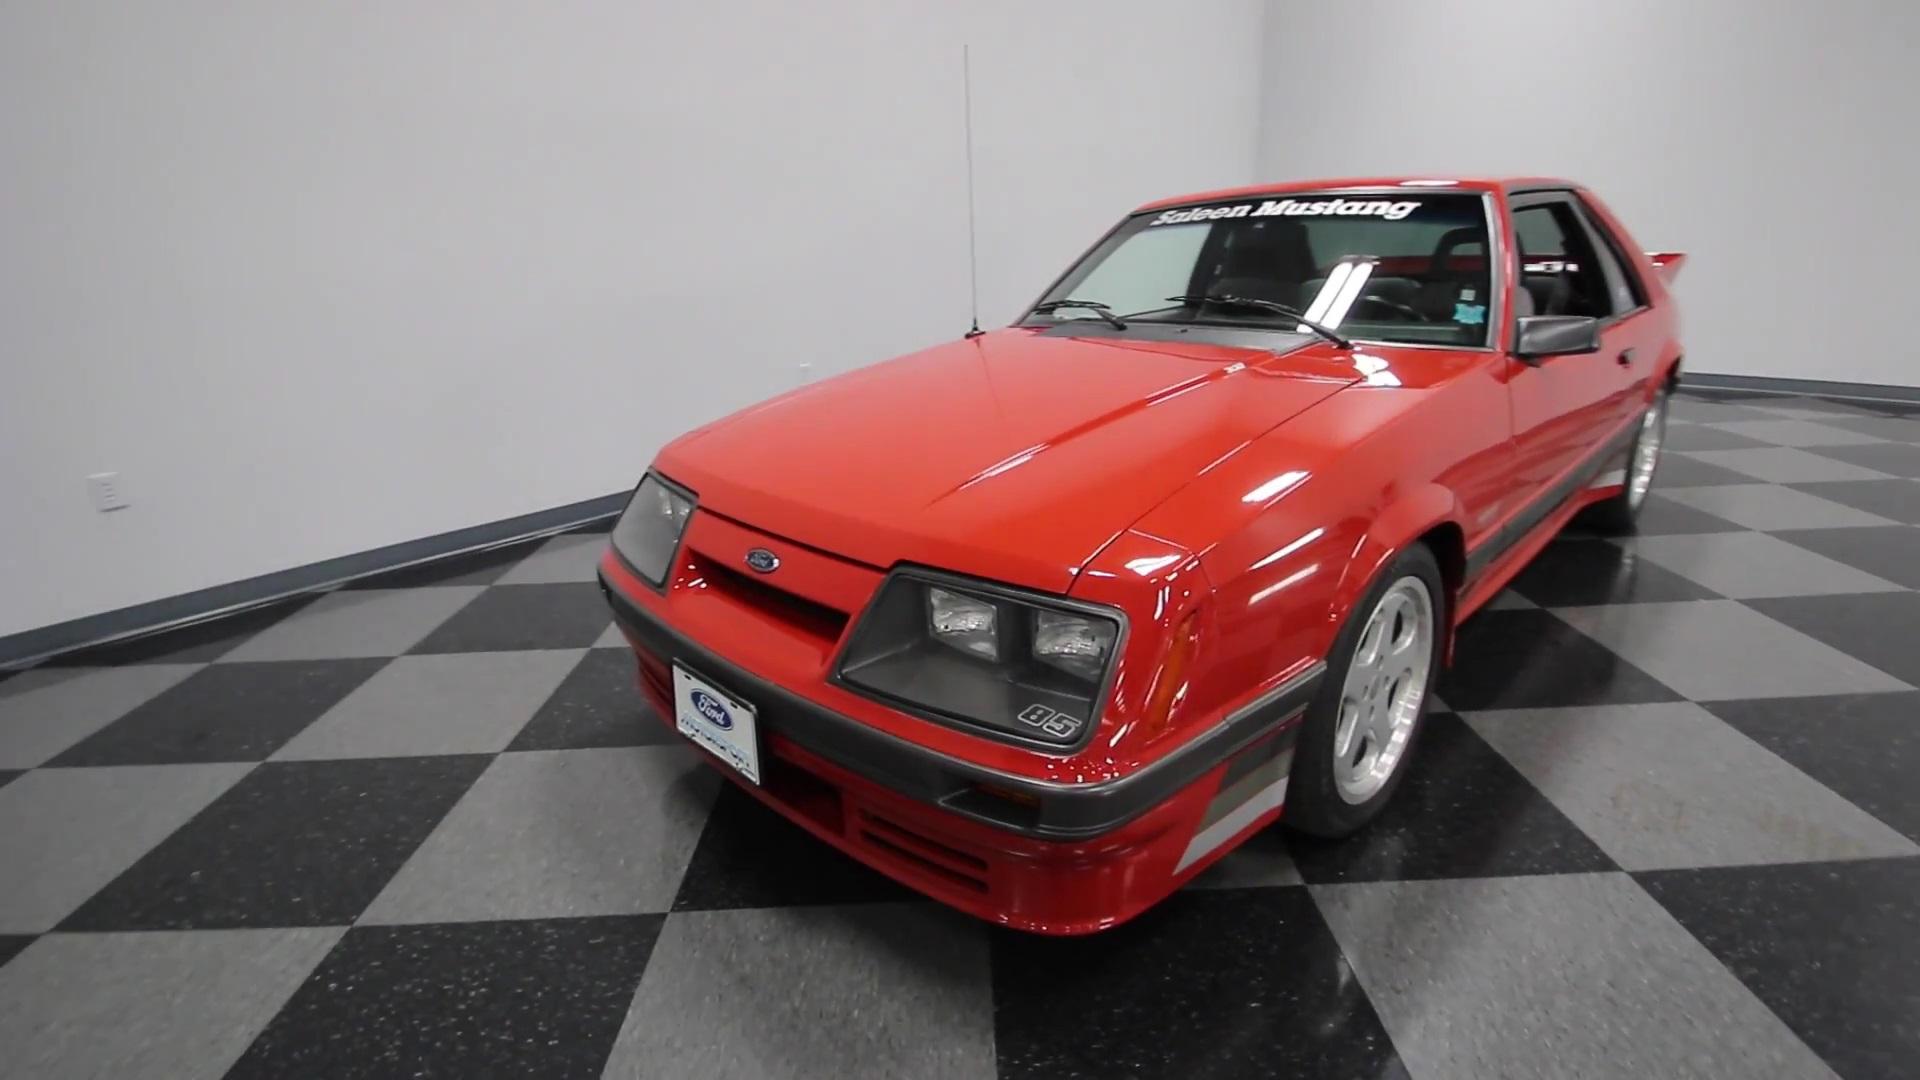 Video: 1986 Saleen Mustang Walkaround